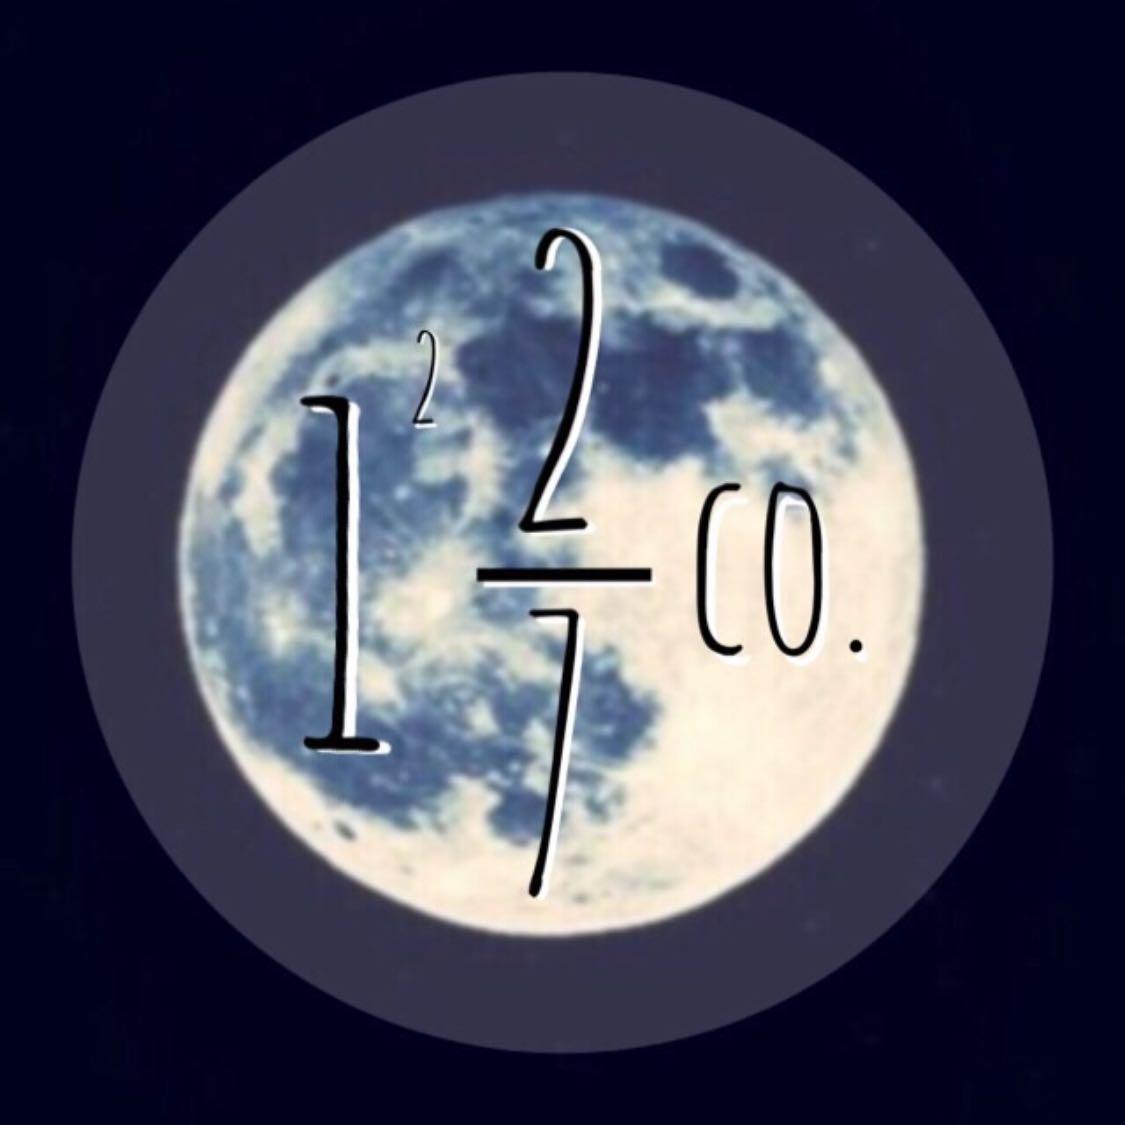 12.7co